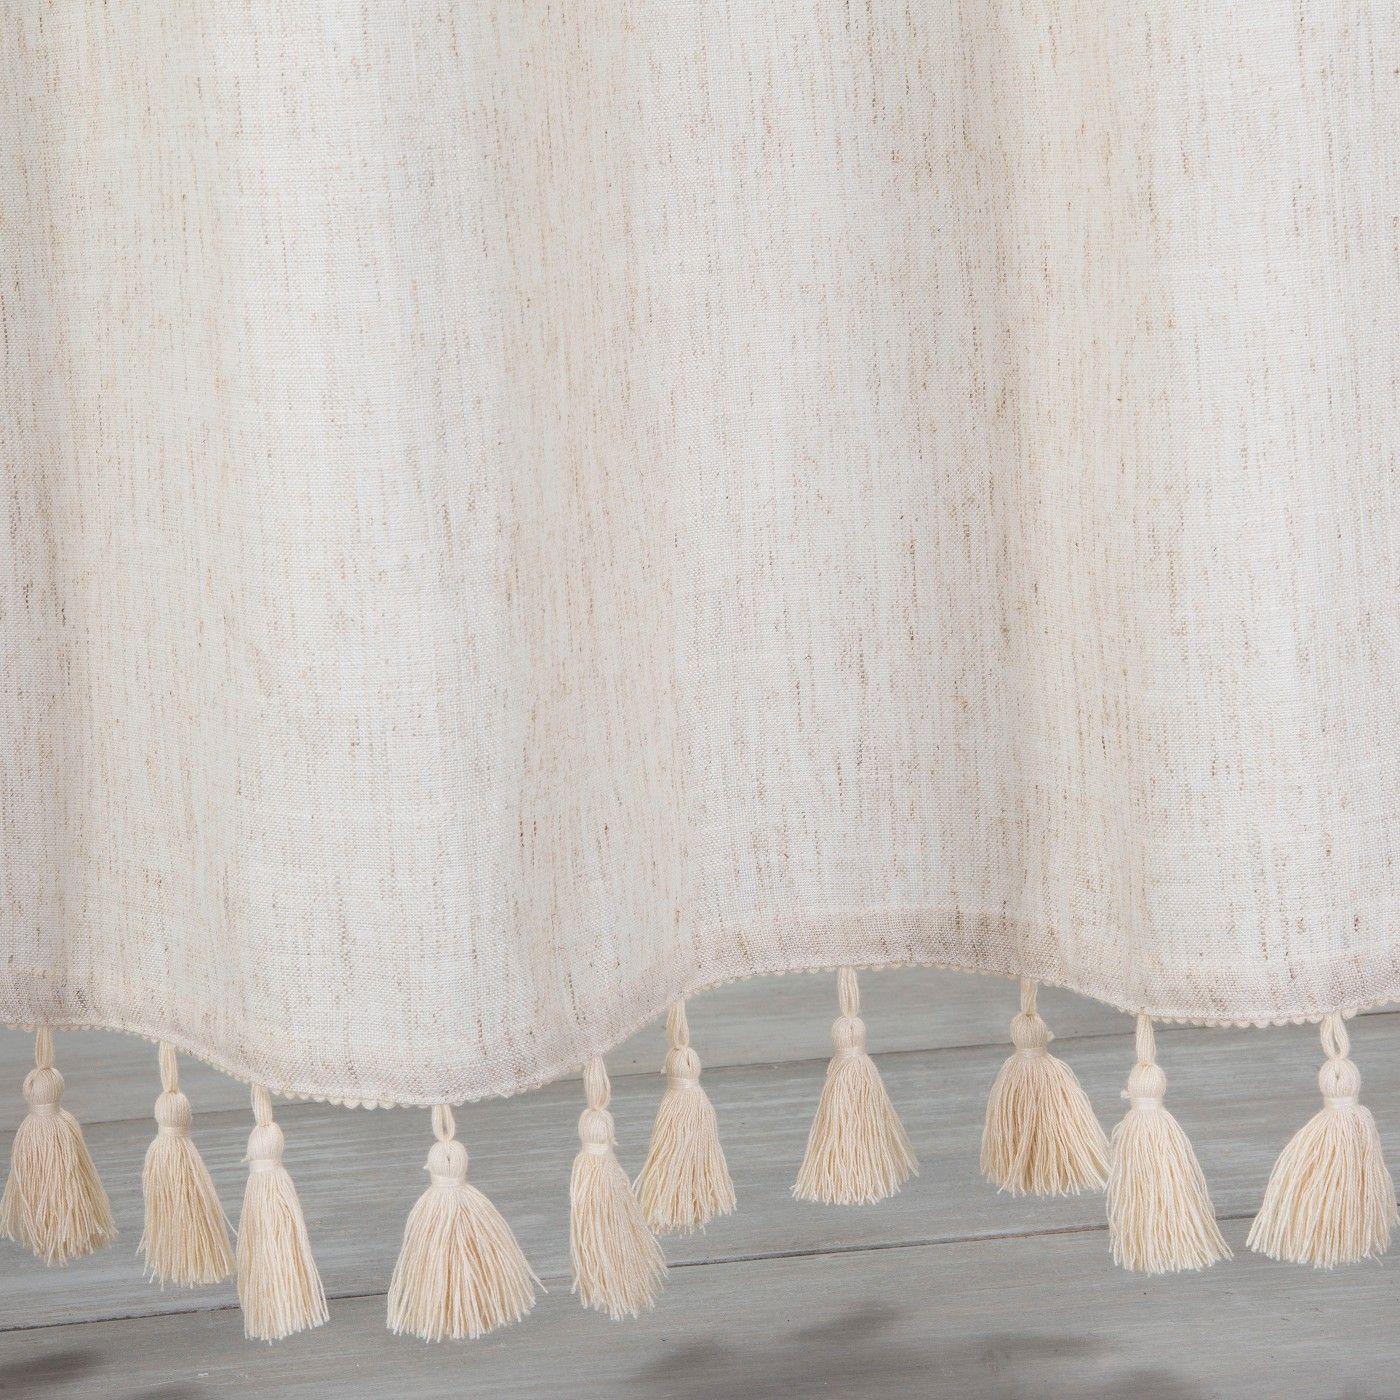 Solid Crochet With Tassels Shower Curtain Tan Opalhouse Diy